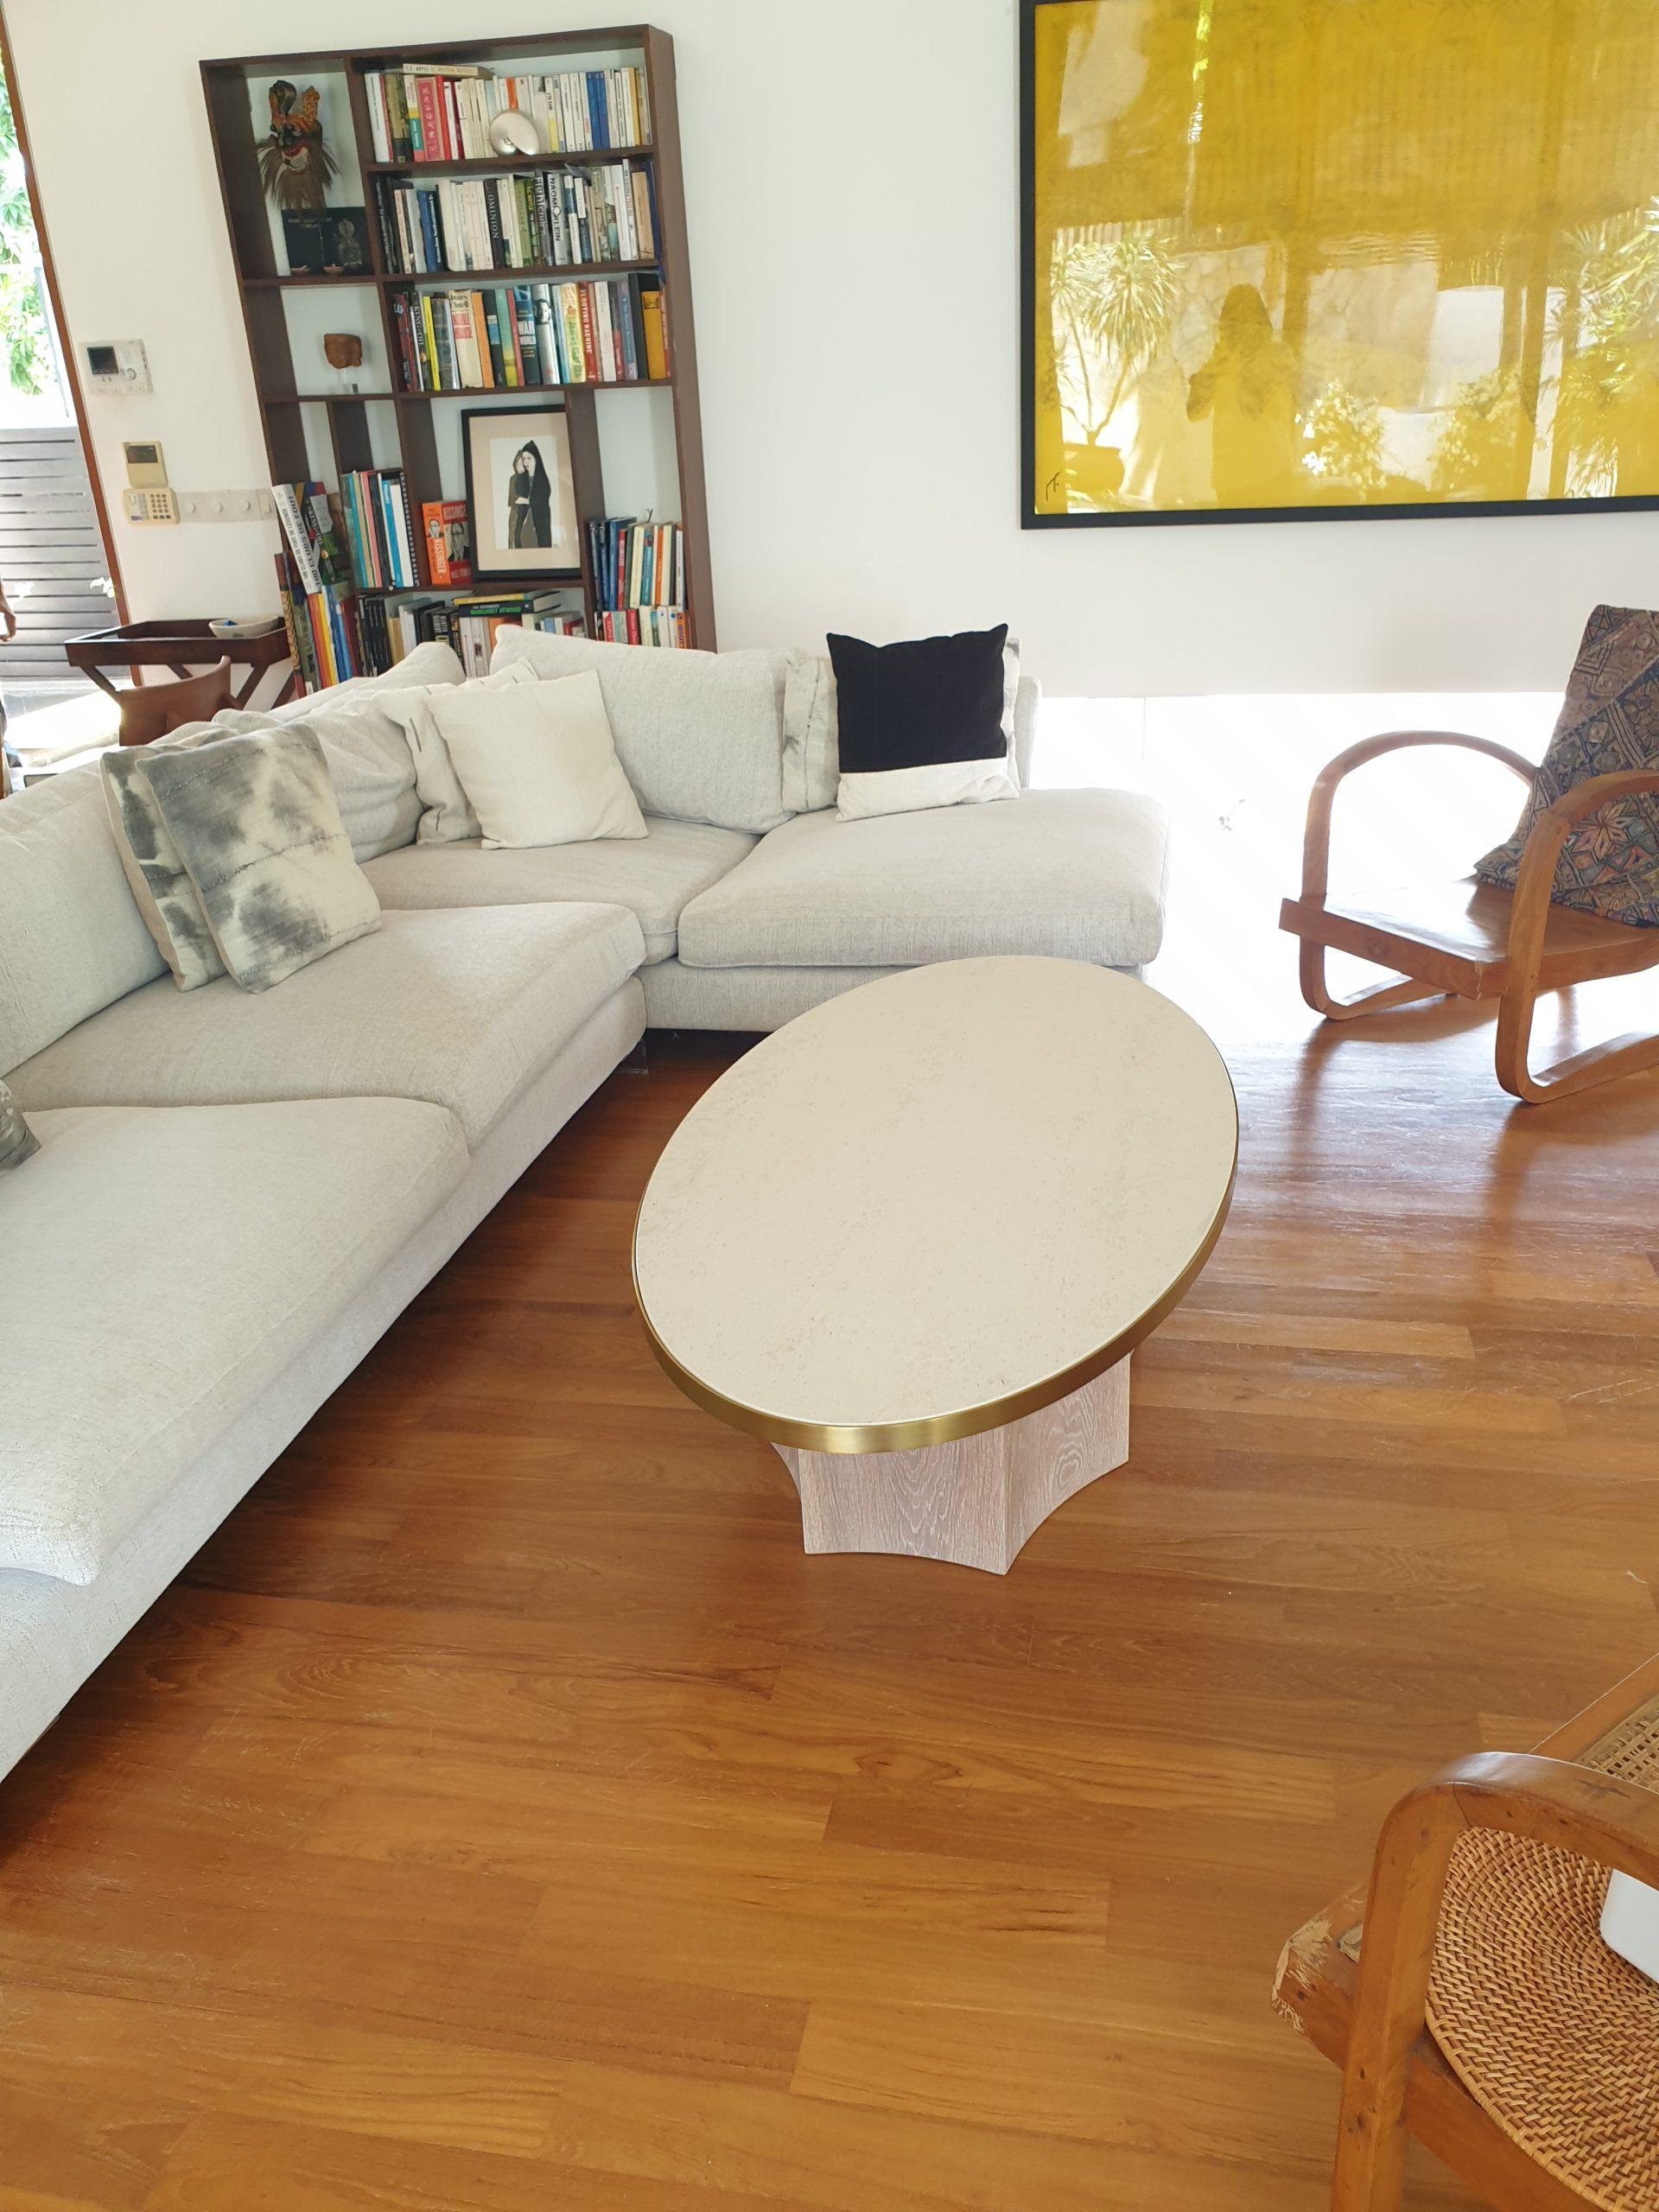 Ocho Coffee Table 1450L x 750W x 400H, Dekton, Danae, Oak, White wash, SS, Gold (2)